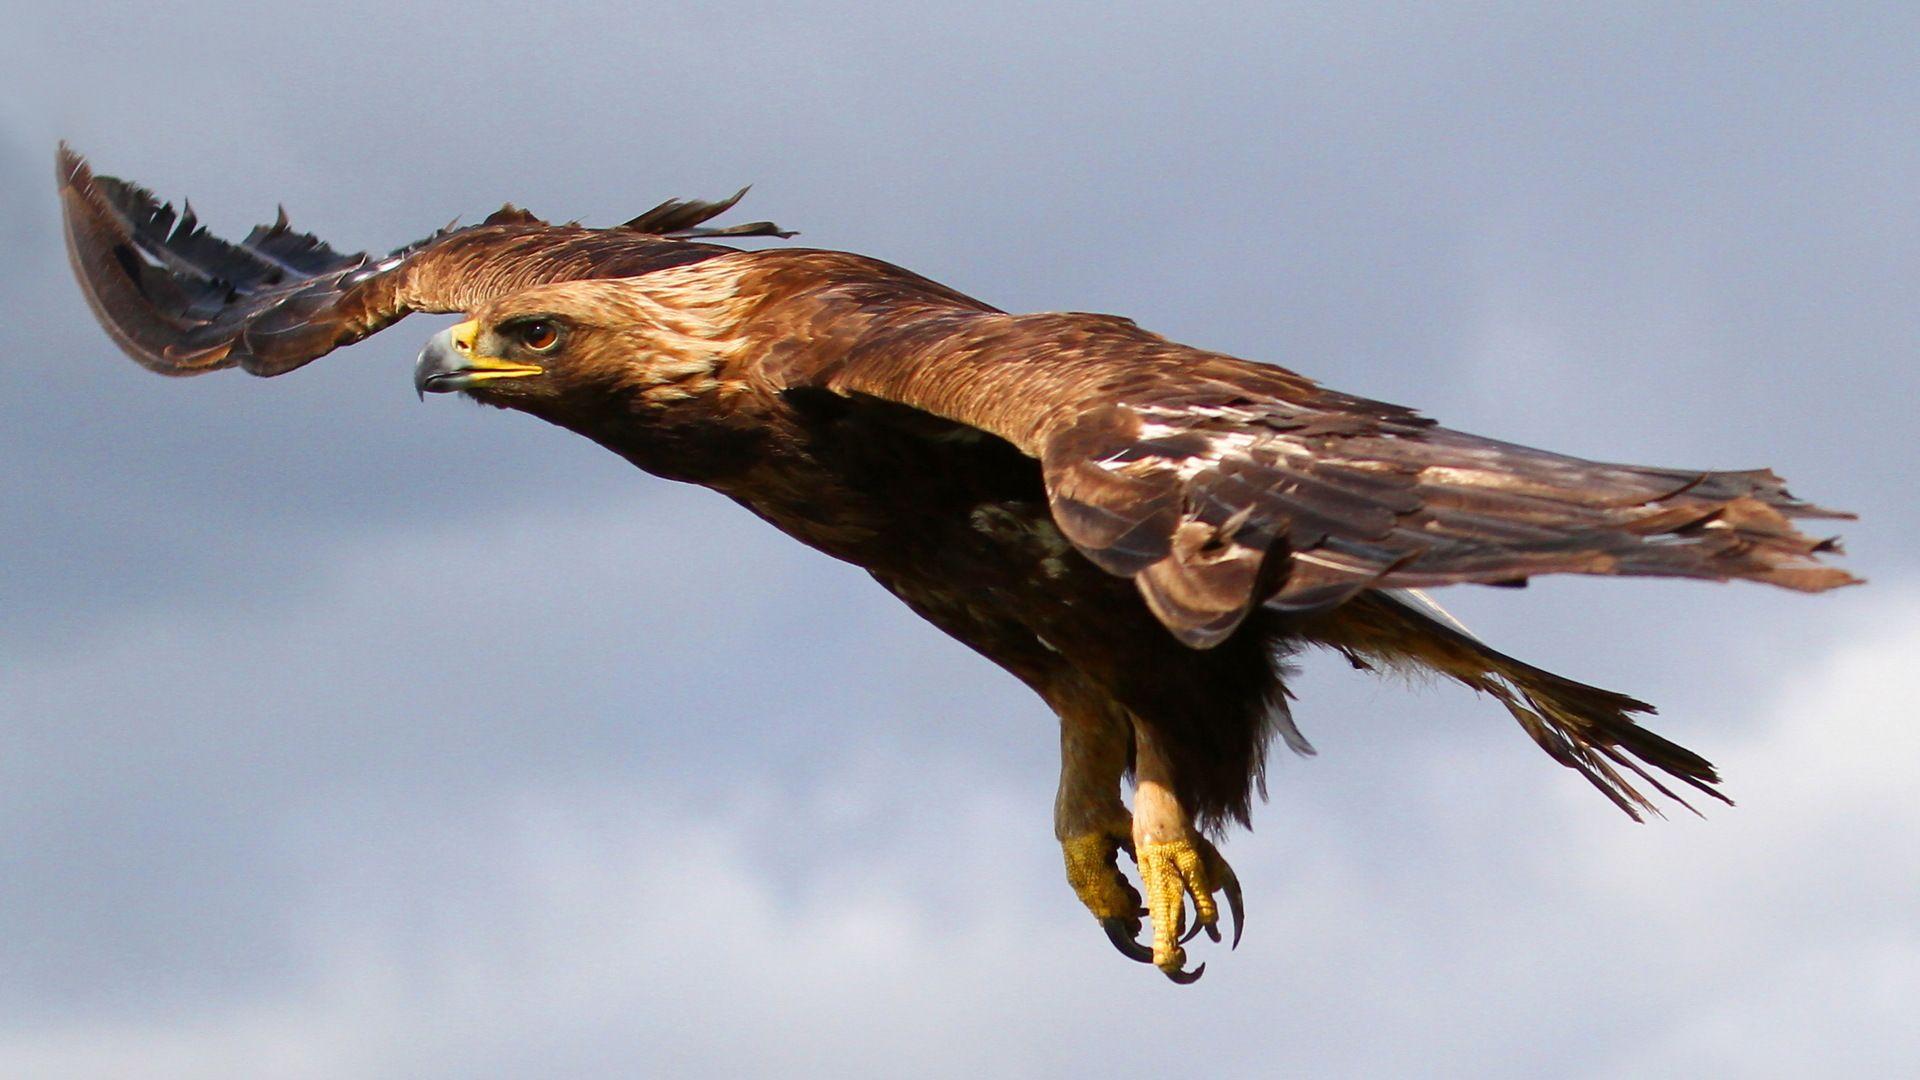 Eagle Photo Of Birds In Flight